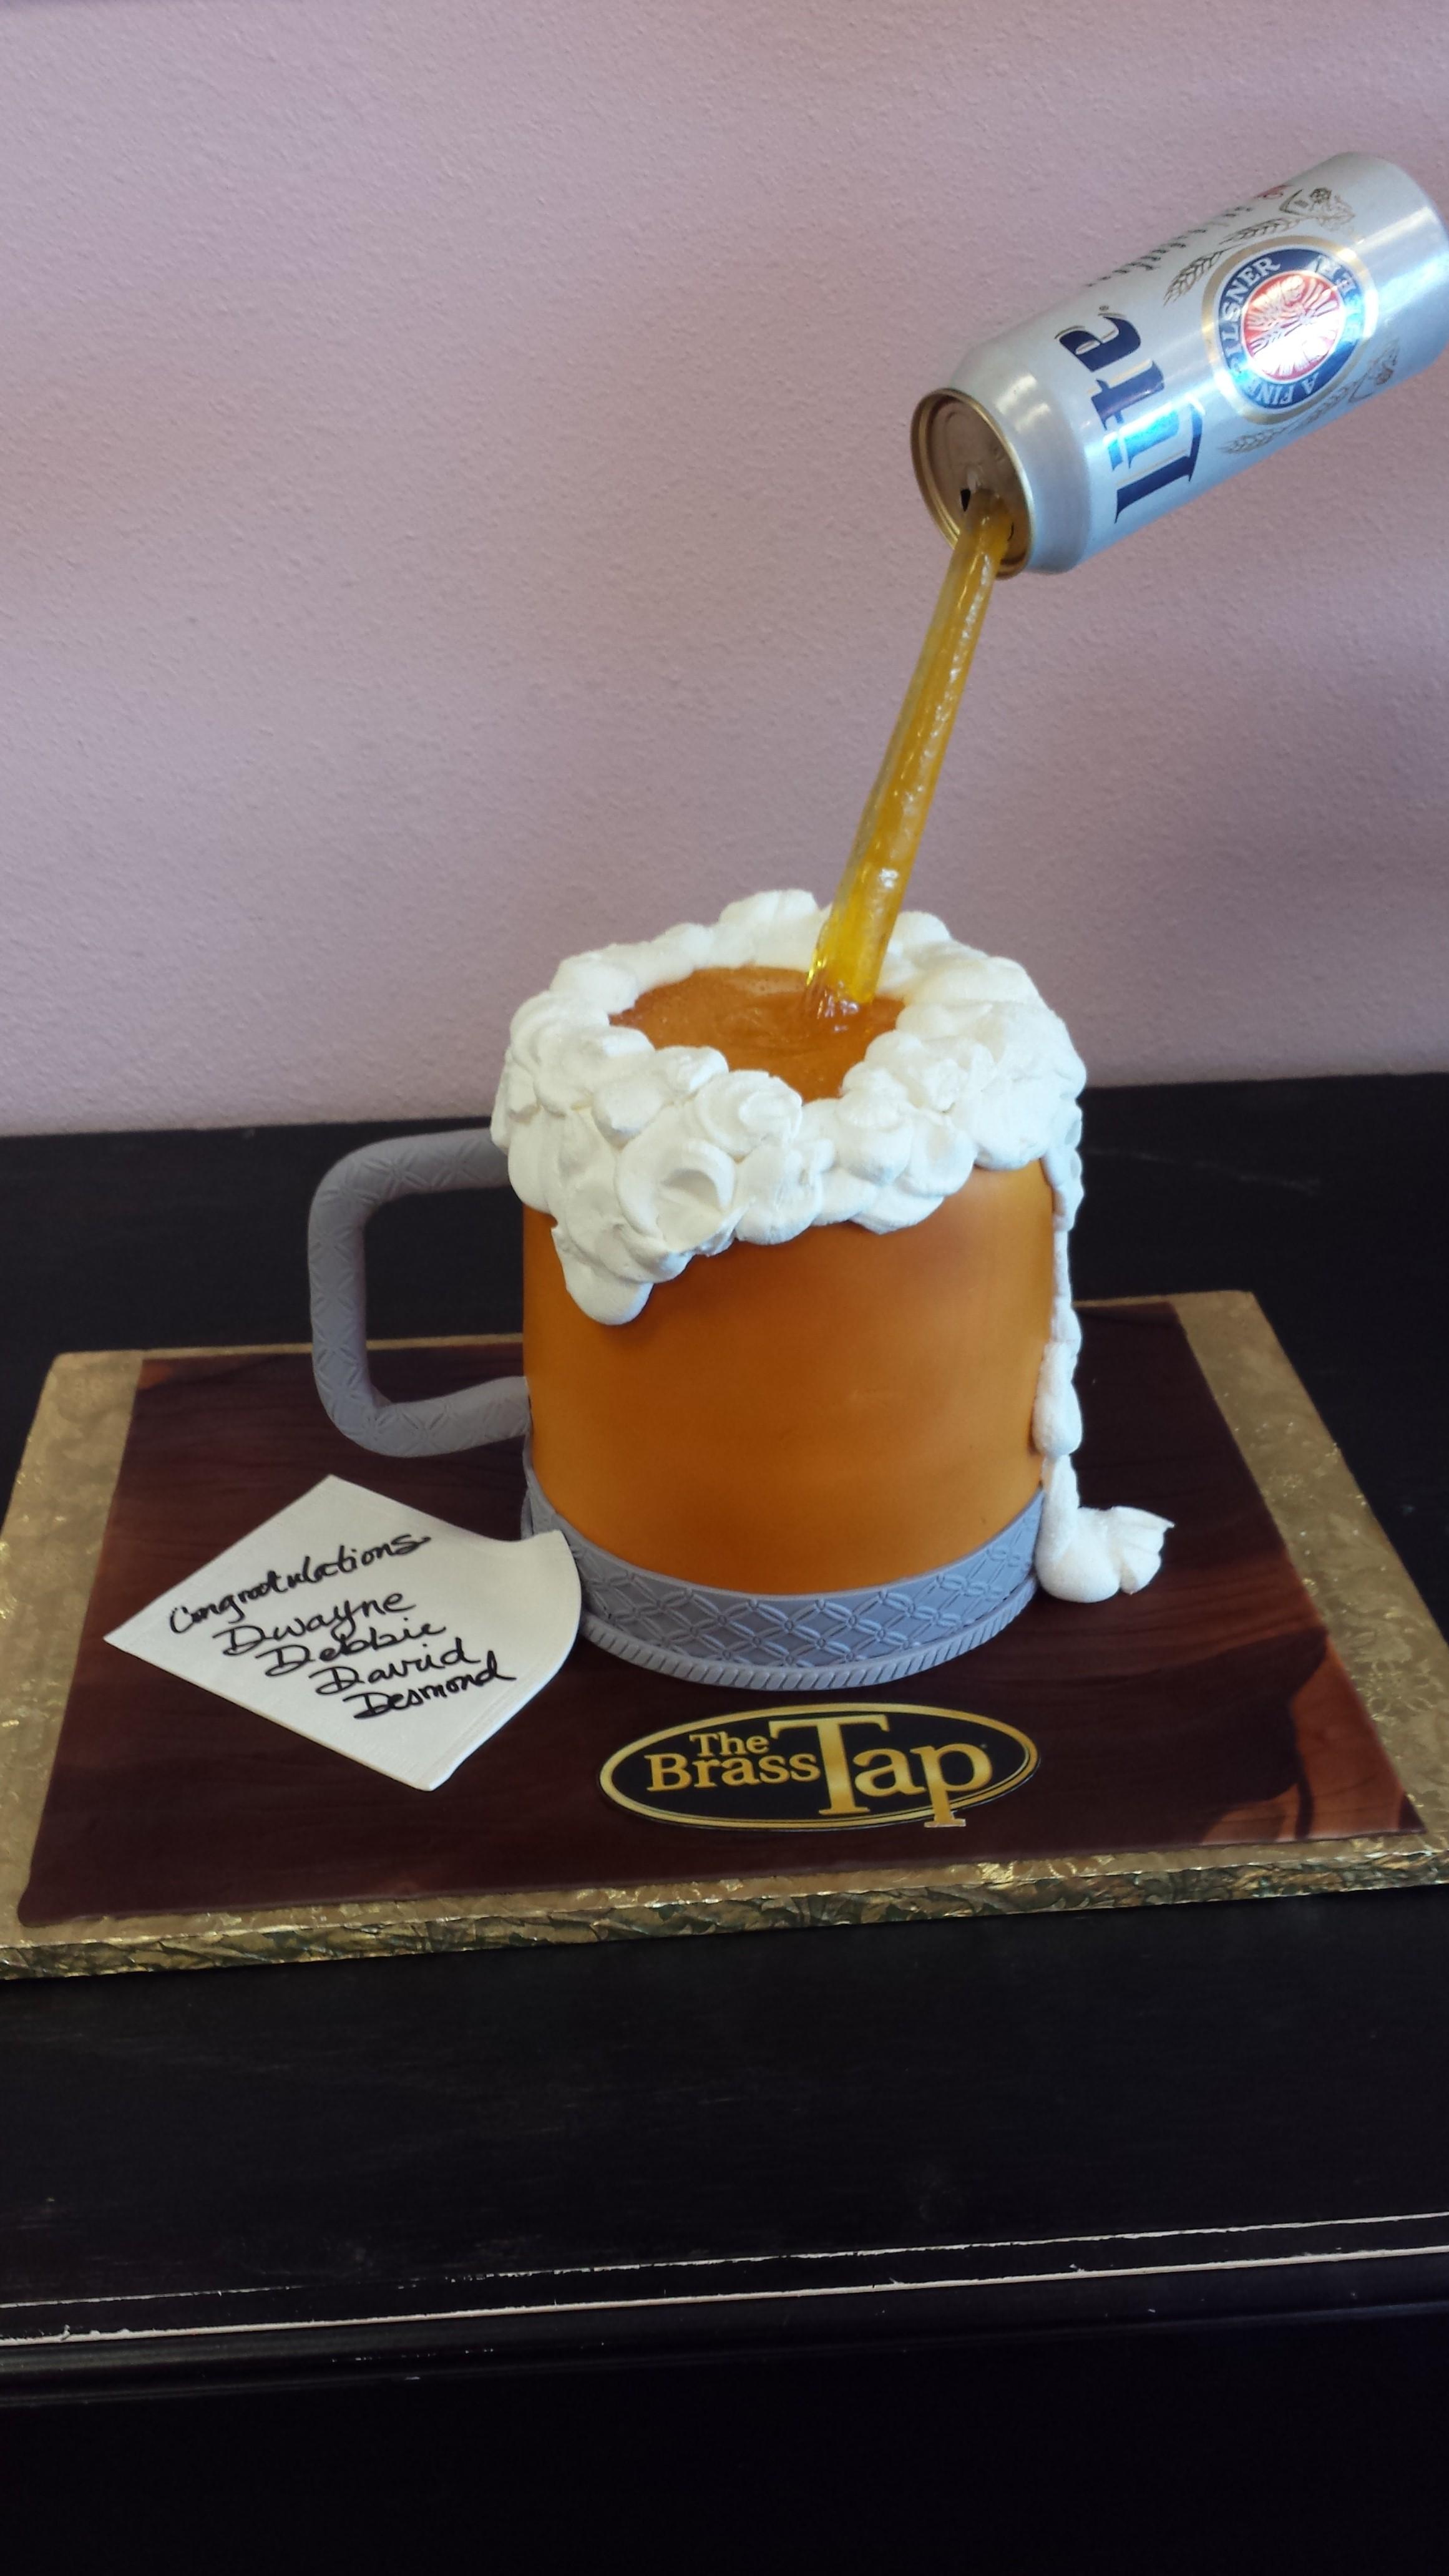 Jan 15 New Cake stuff 2015-01-17 001